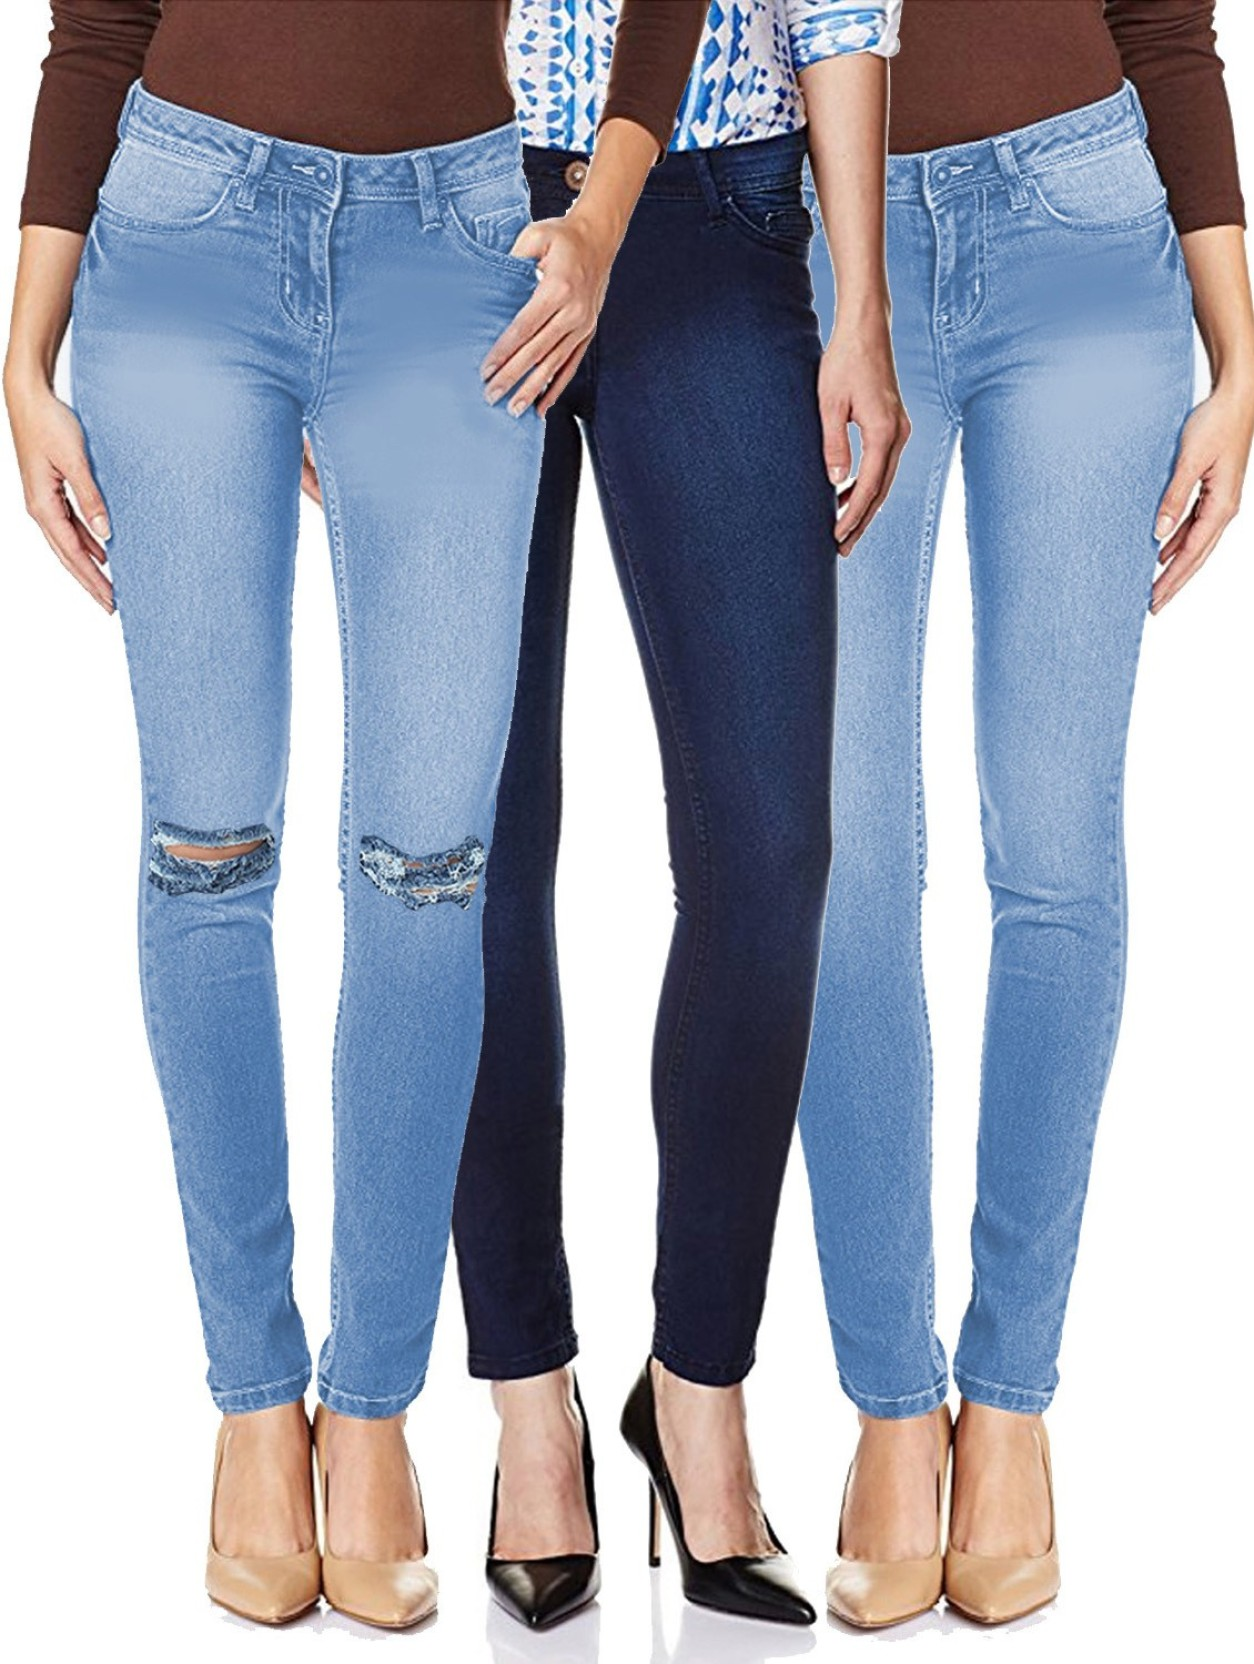 Fuego Regular Women Light Blue, Blue Jeans - Buy Fuego Regular Women